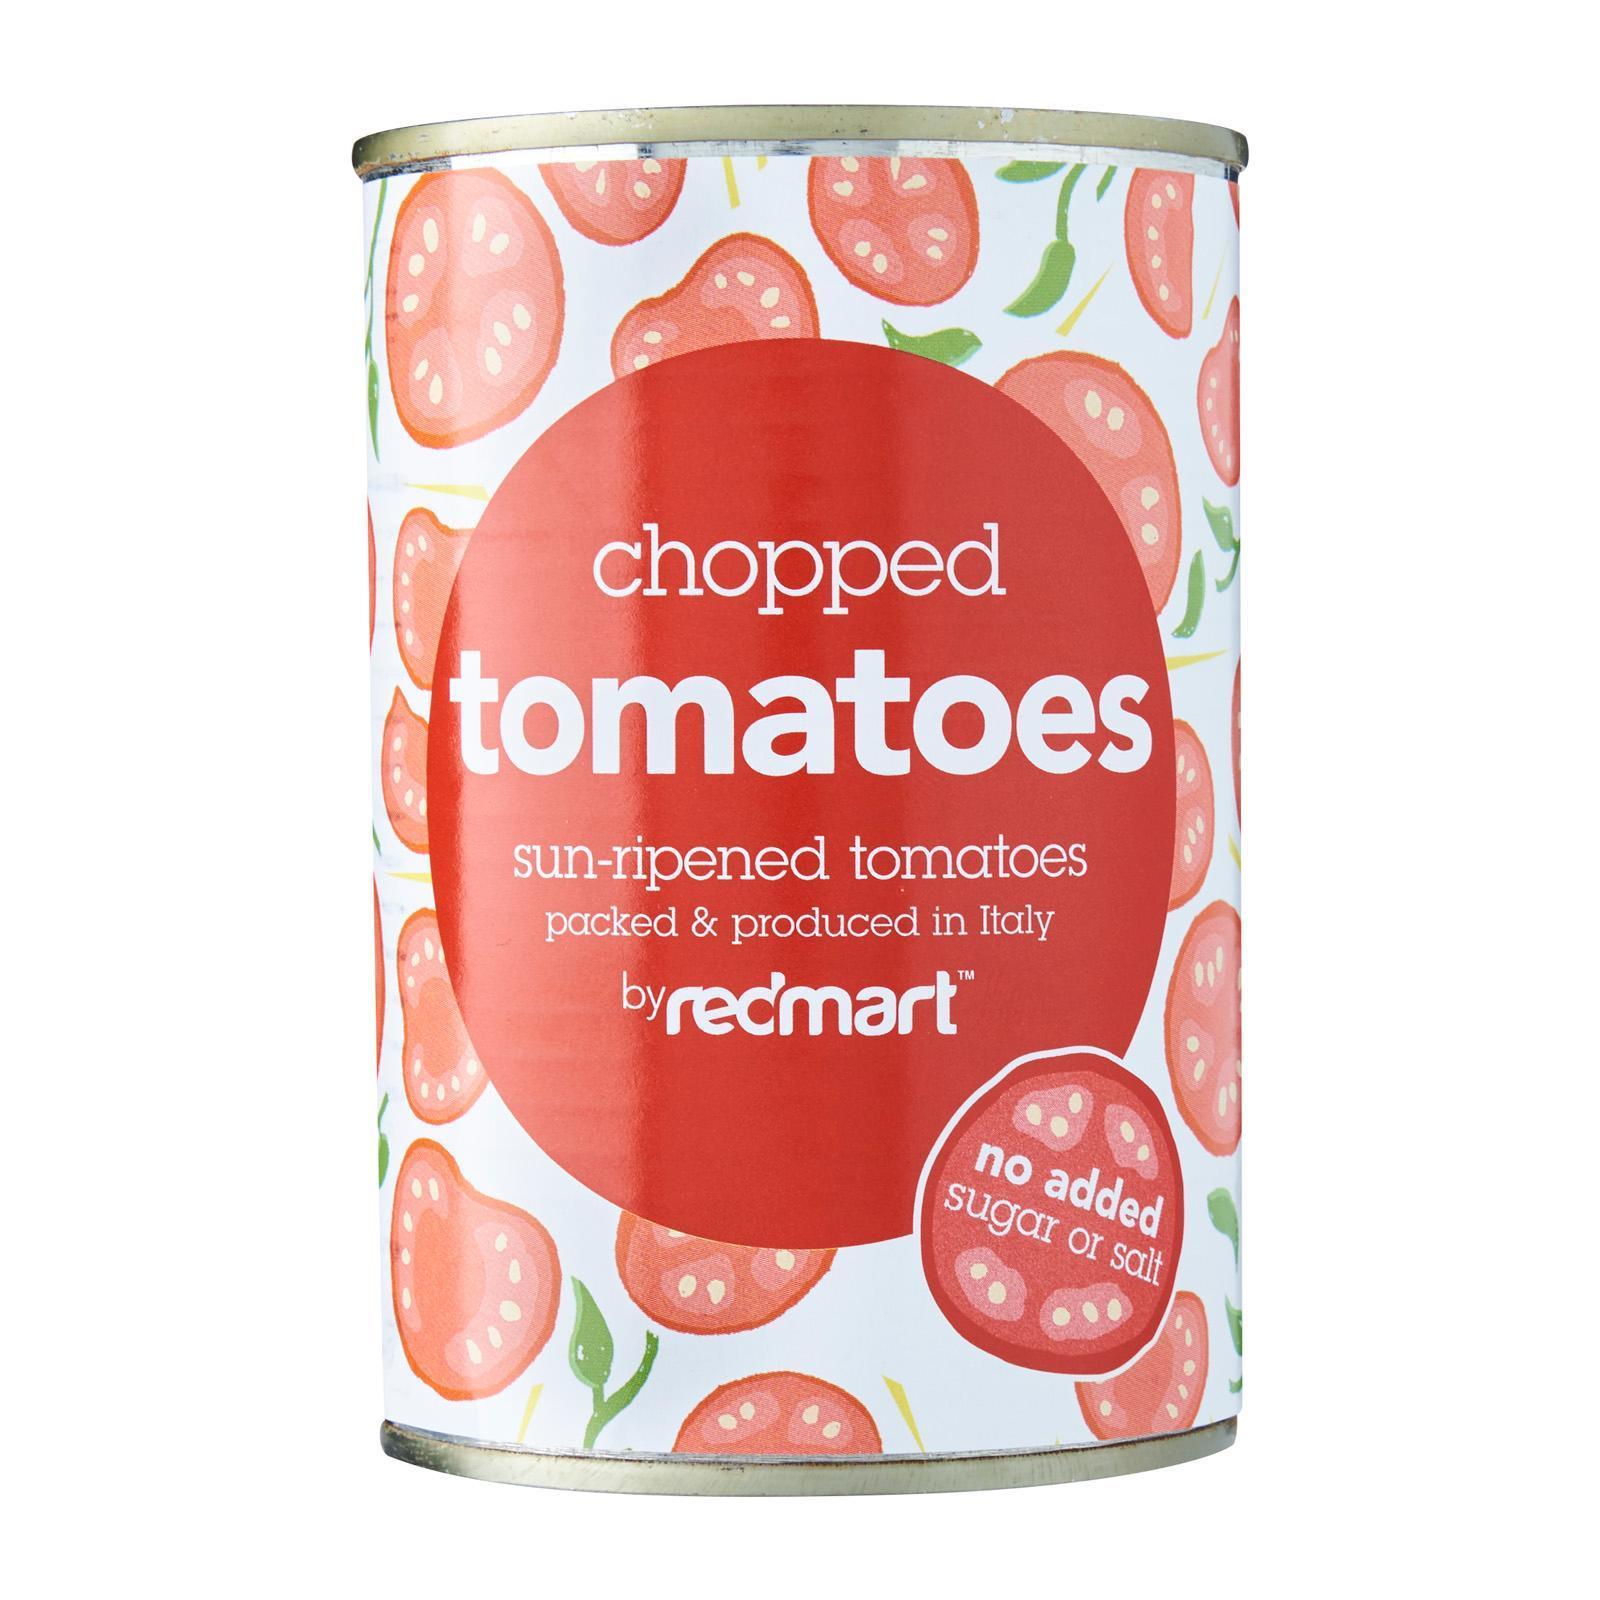 Redmart Italian Chopped Tomatoes By Redmart.